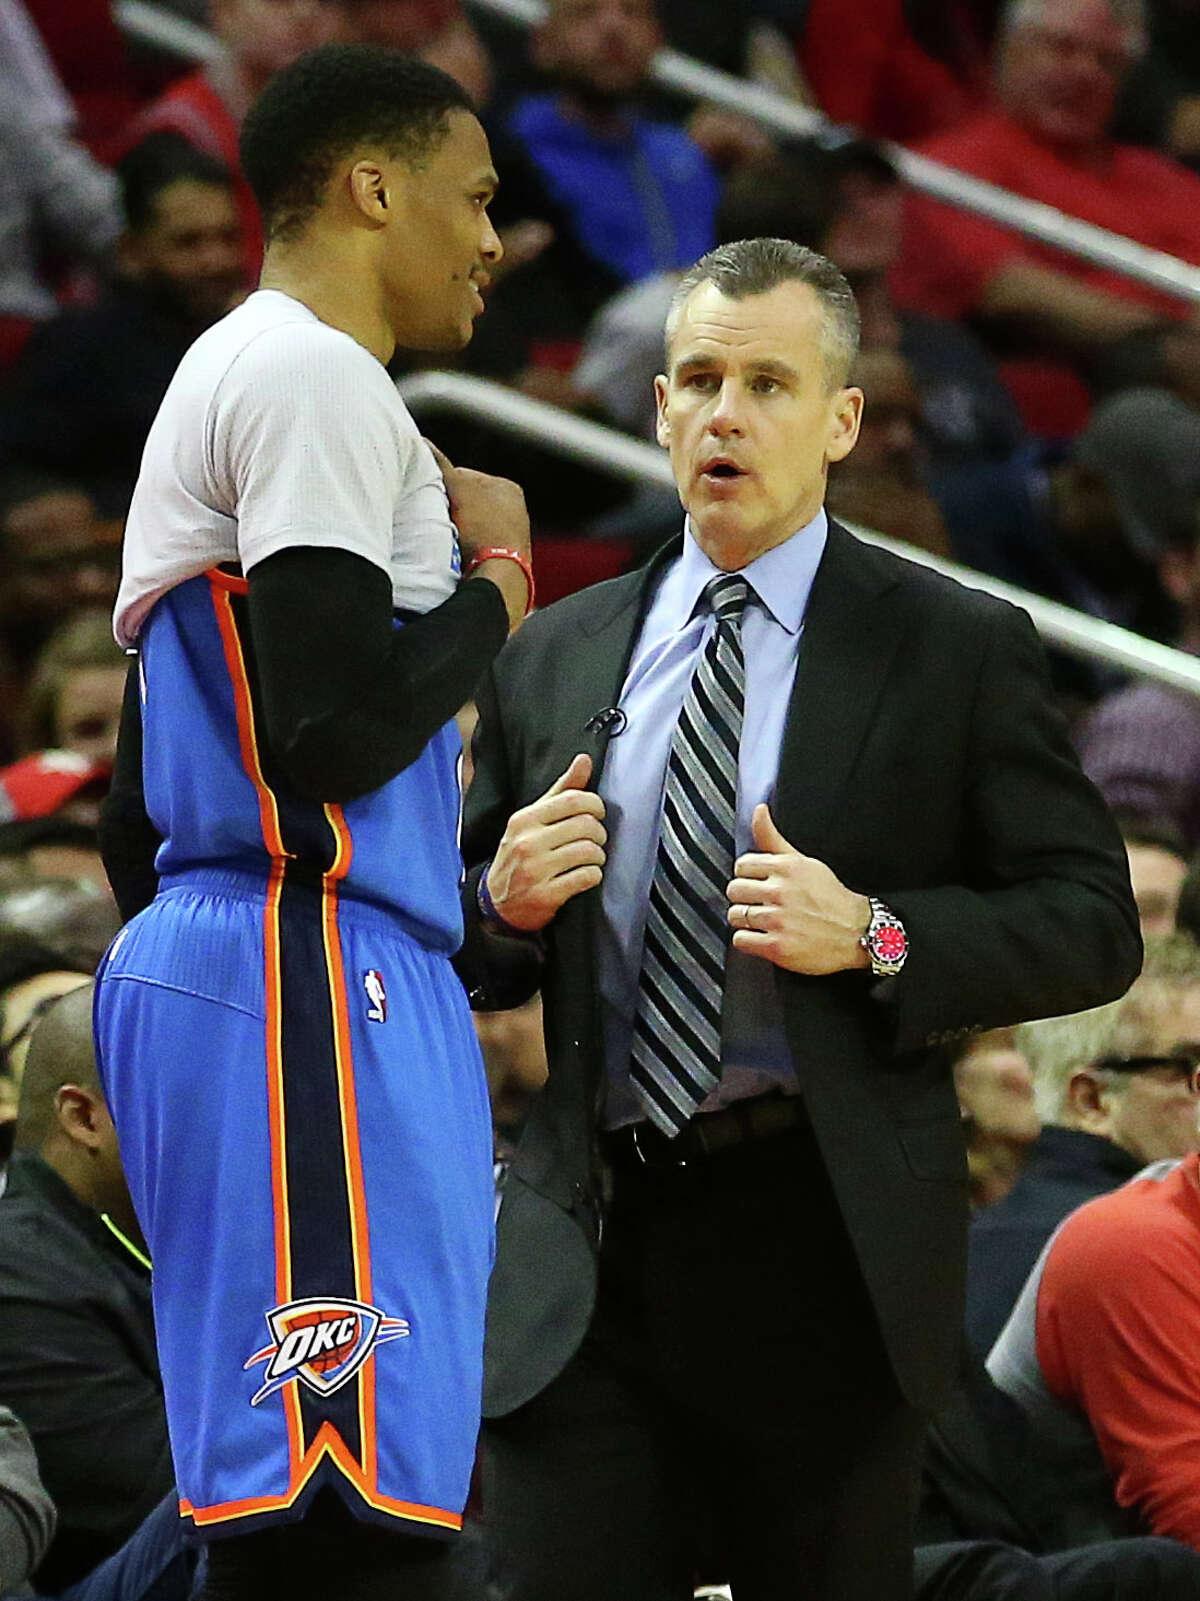 Oklahoma City Thunder head coach Billy Donovan talks with Oklahoma City Thunder guard Russell Westbrook (0) during the fourth quarter of an NBA game at the Toyota Center, Thursday, Jan. 5, 2017, in Houston. ( Jon Shapley / Houston Chronicle )